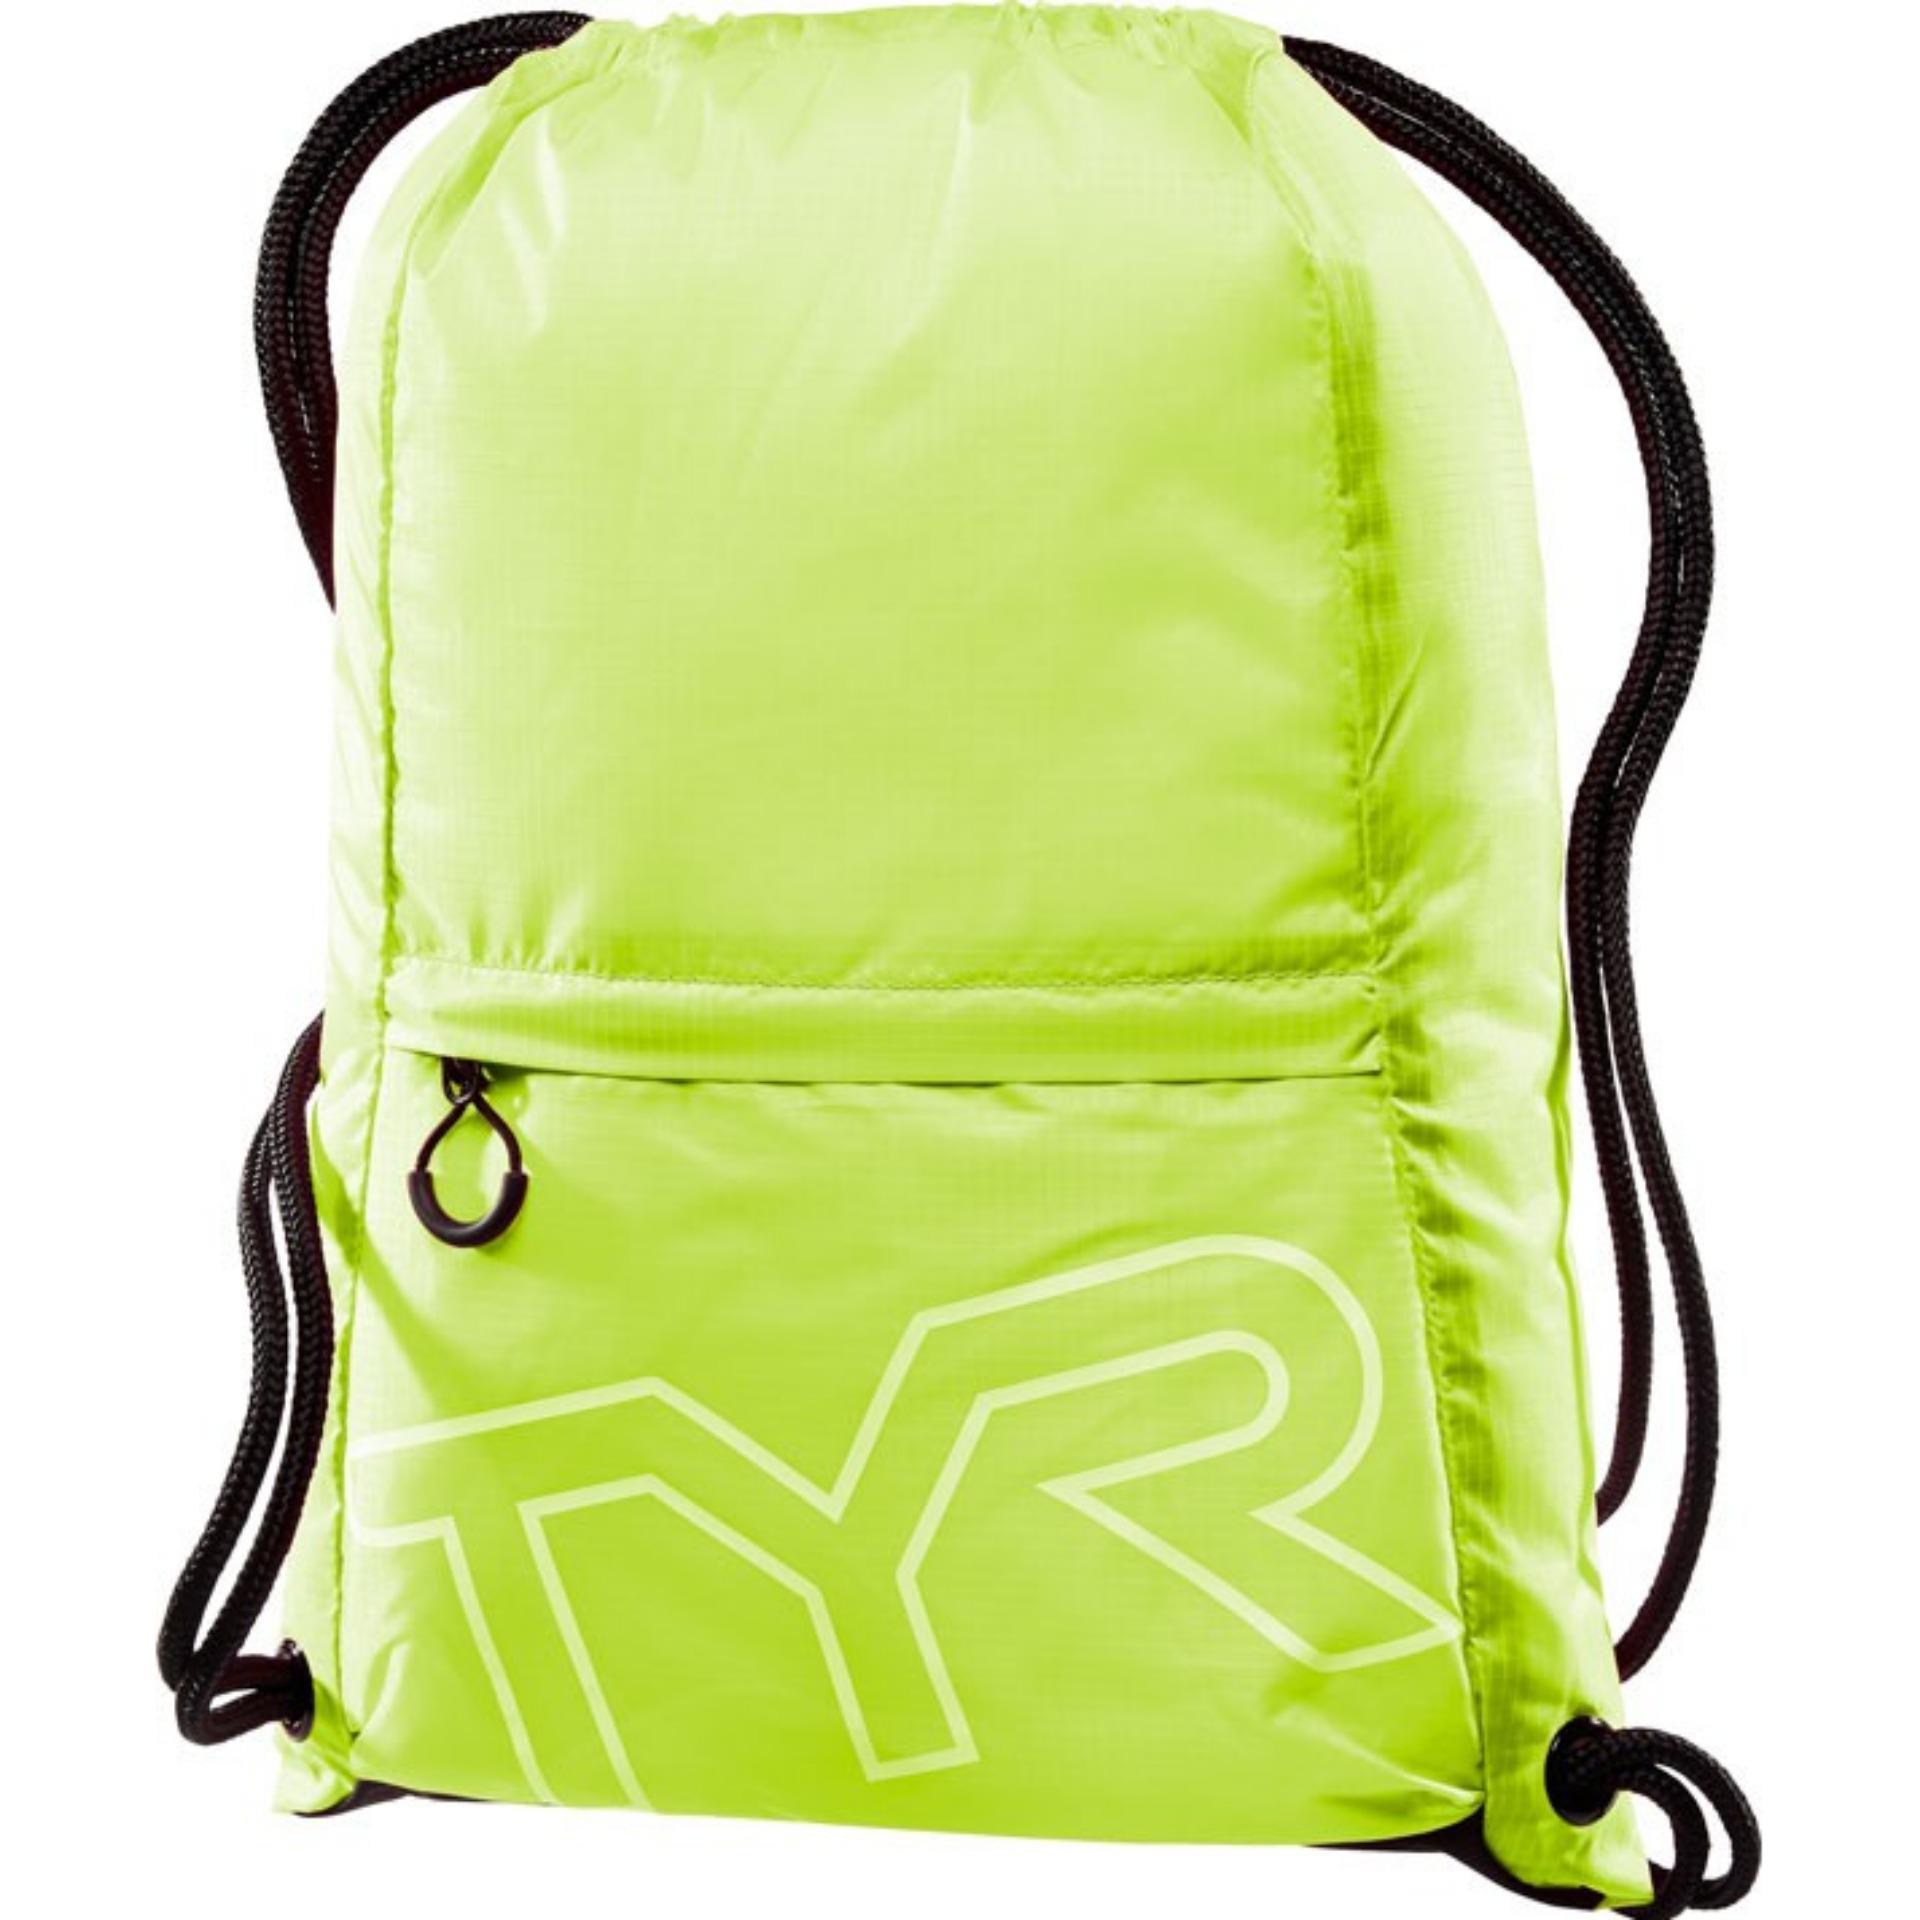 Drawstring Bags - Buy Drawstring Bags at Best Price in Singapore ... ed35daf891a5d